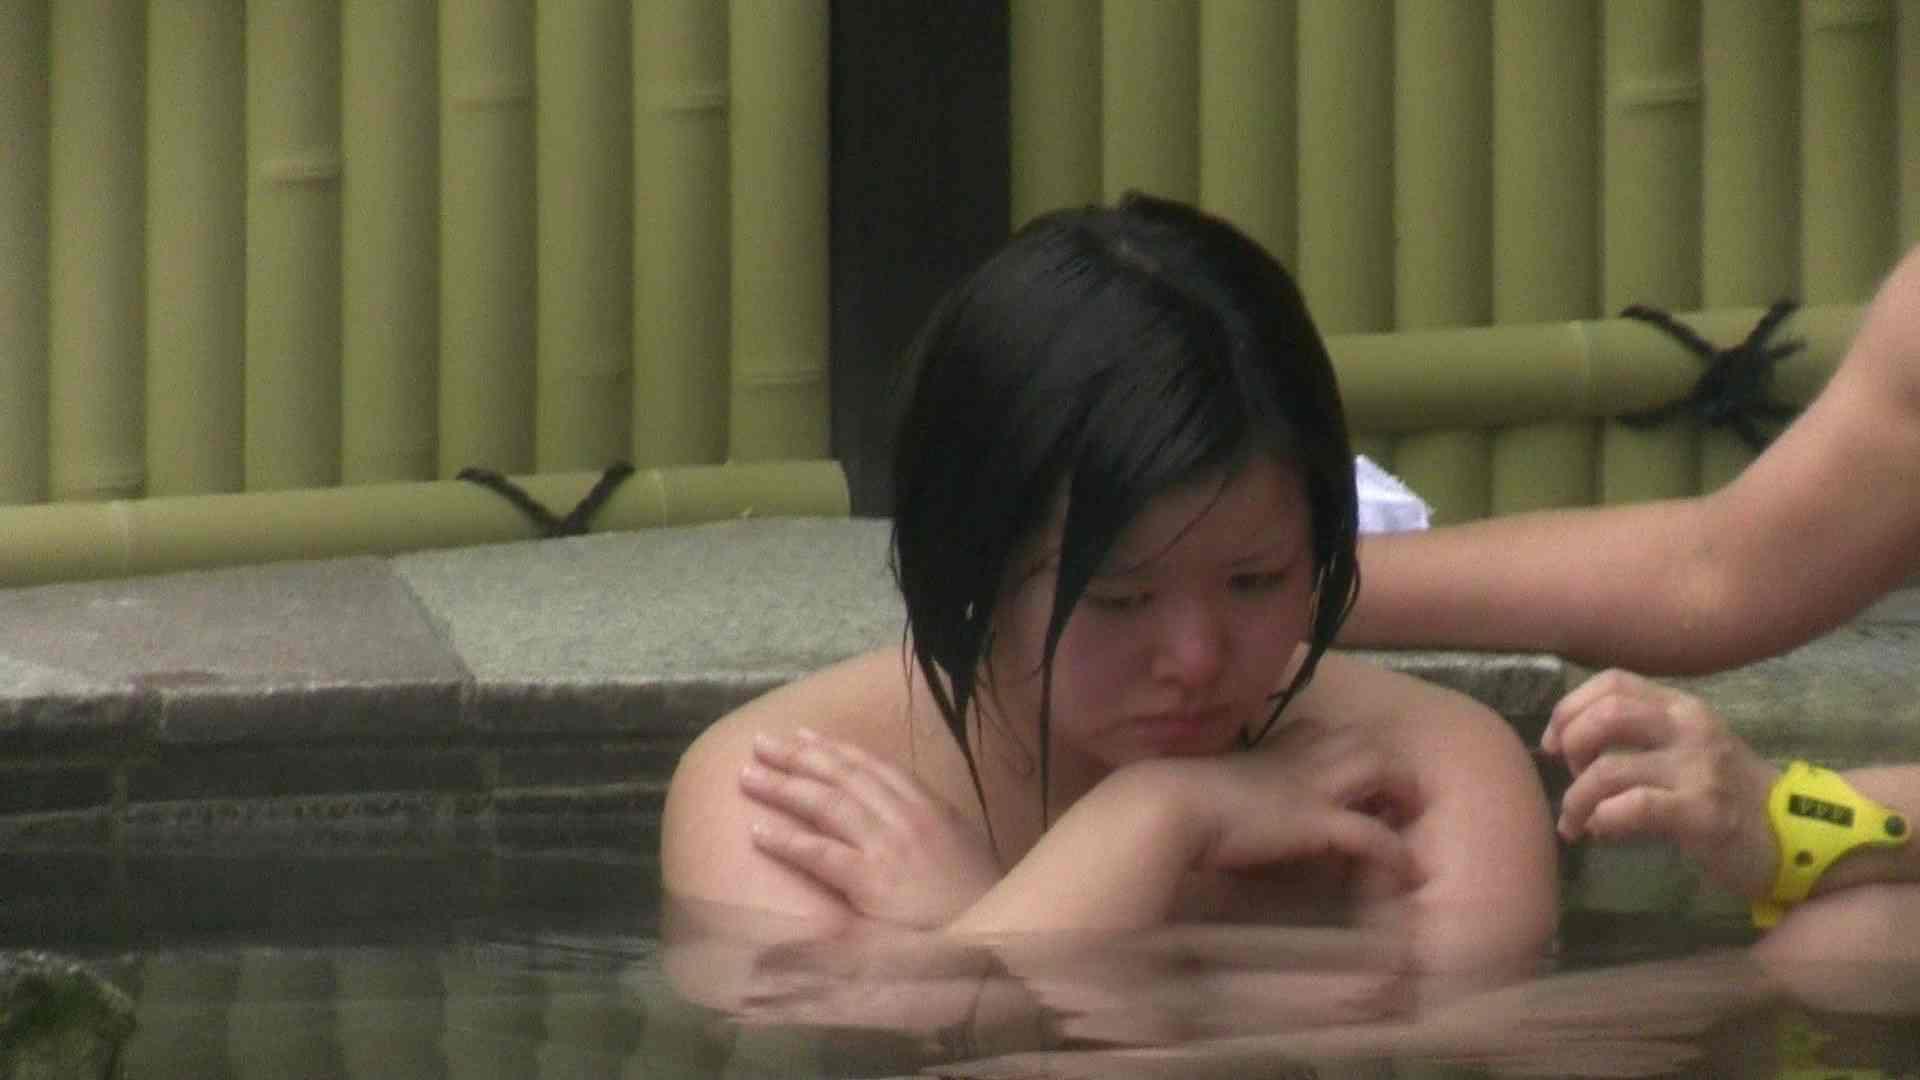 Aquaな露天風呂Vol.683 盗撮  69pic 3